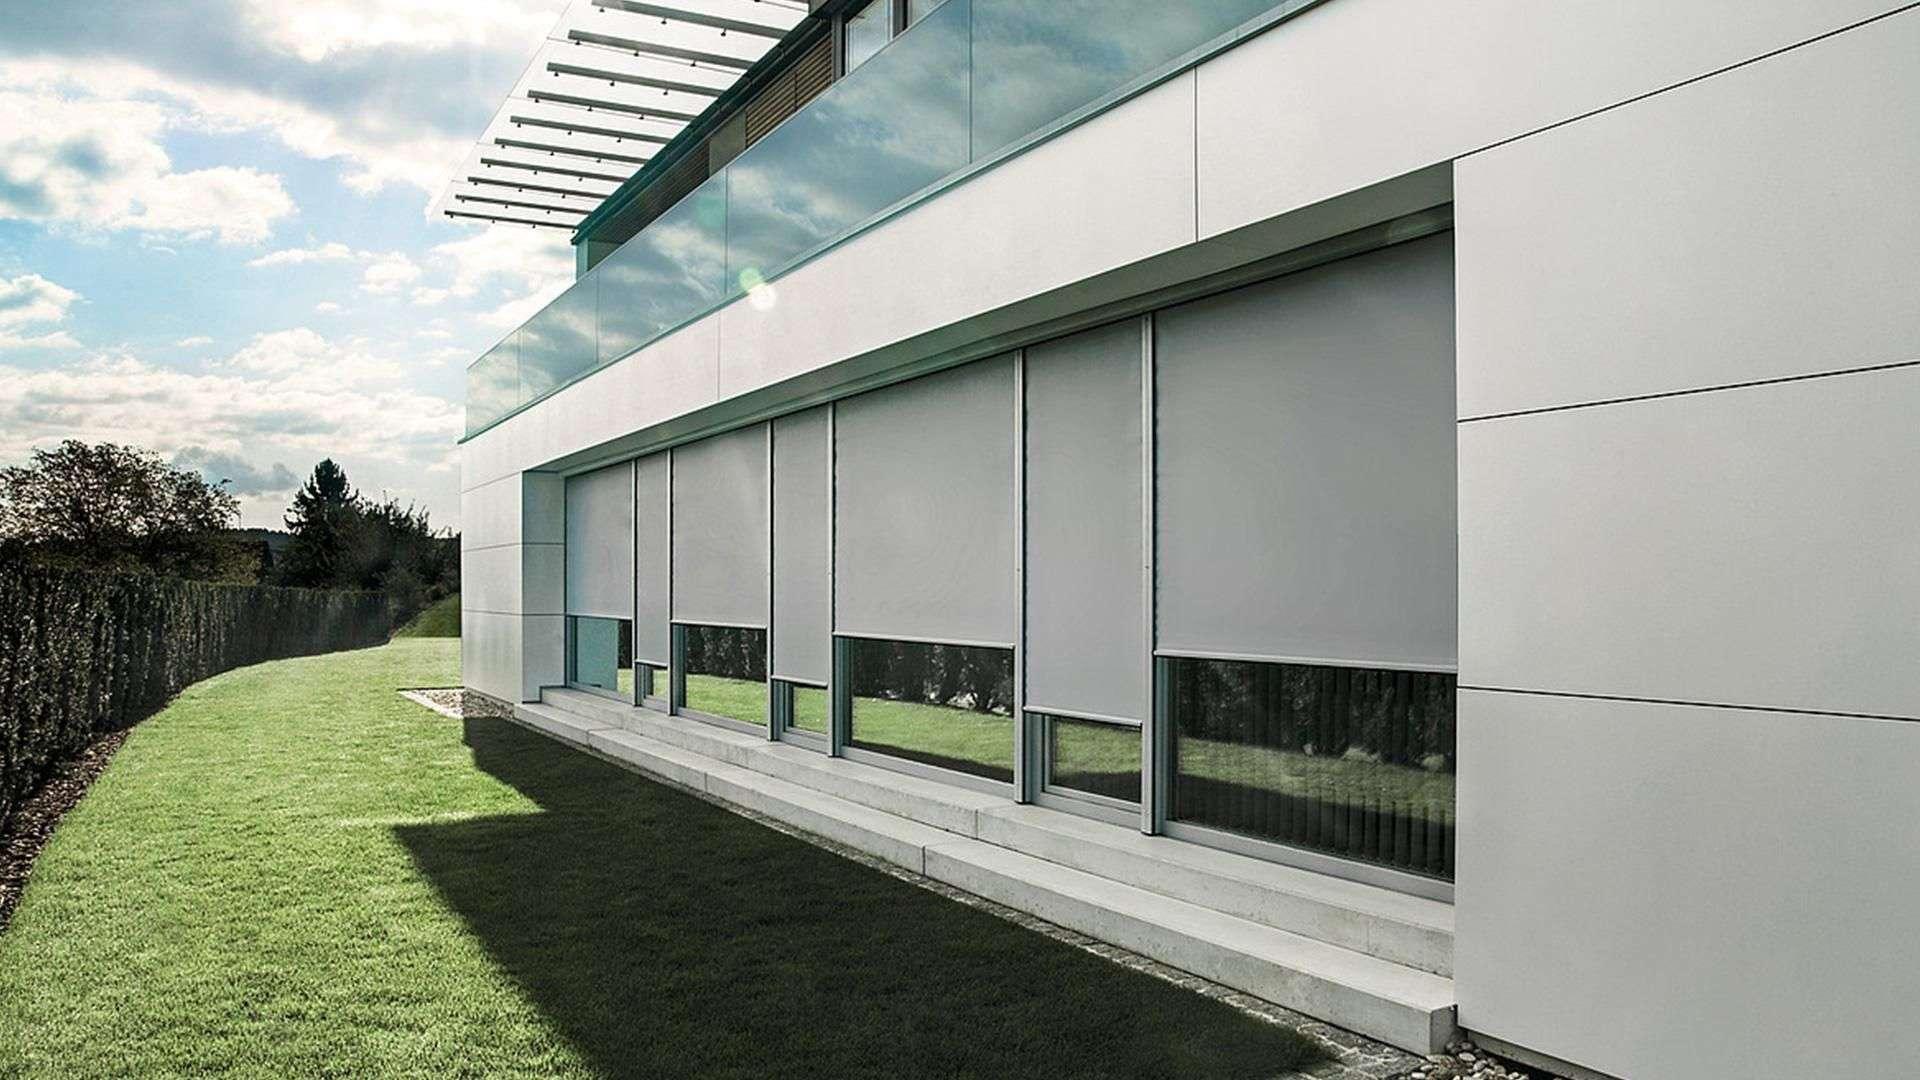 Fassade mit Textilscreens